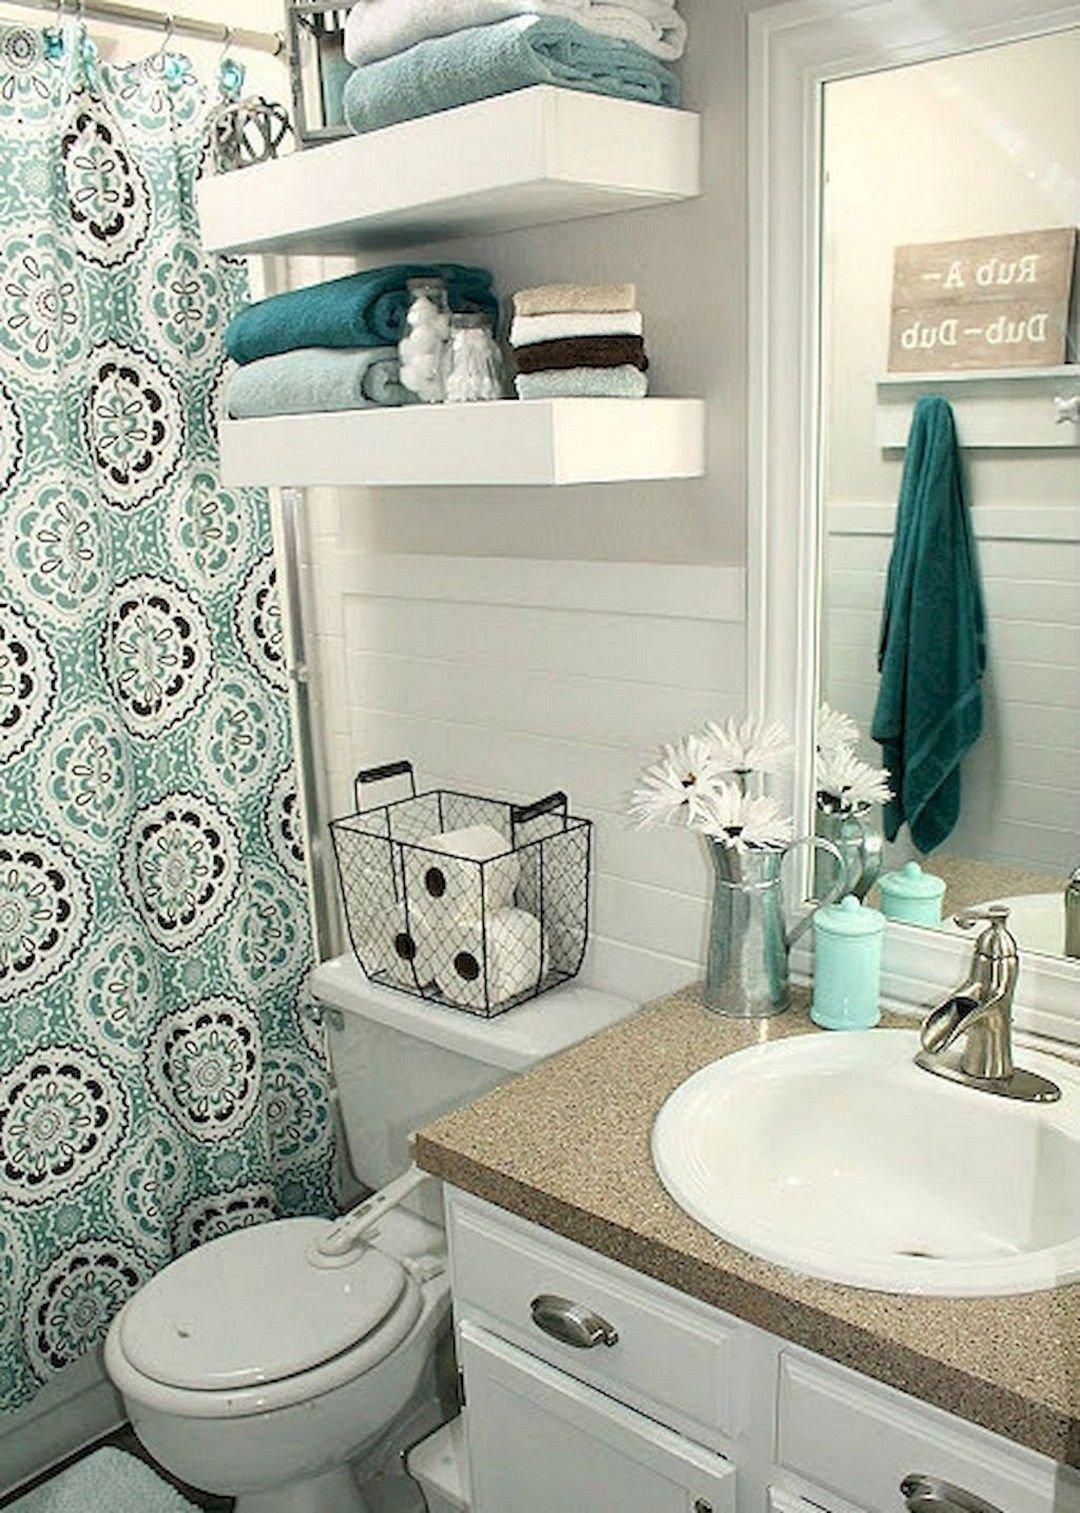 10 Beautiful Decorating Ideas On A Budget 90 diy apartment decorating ideas on a budget apartments 2021